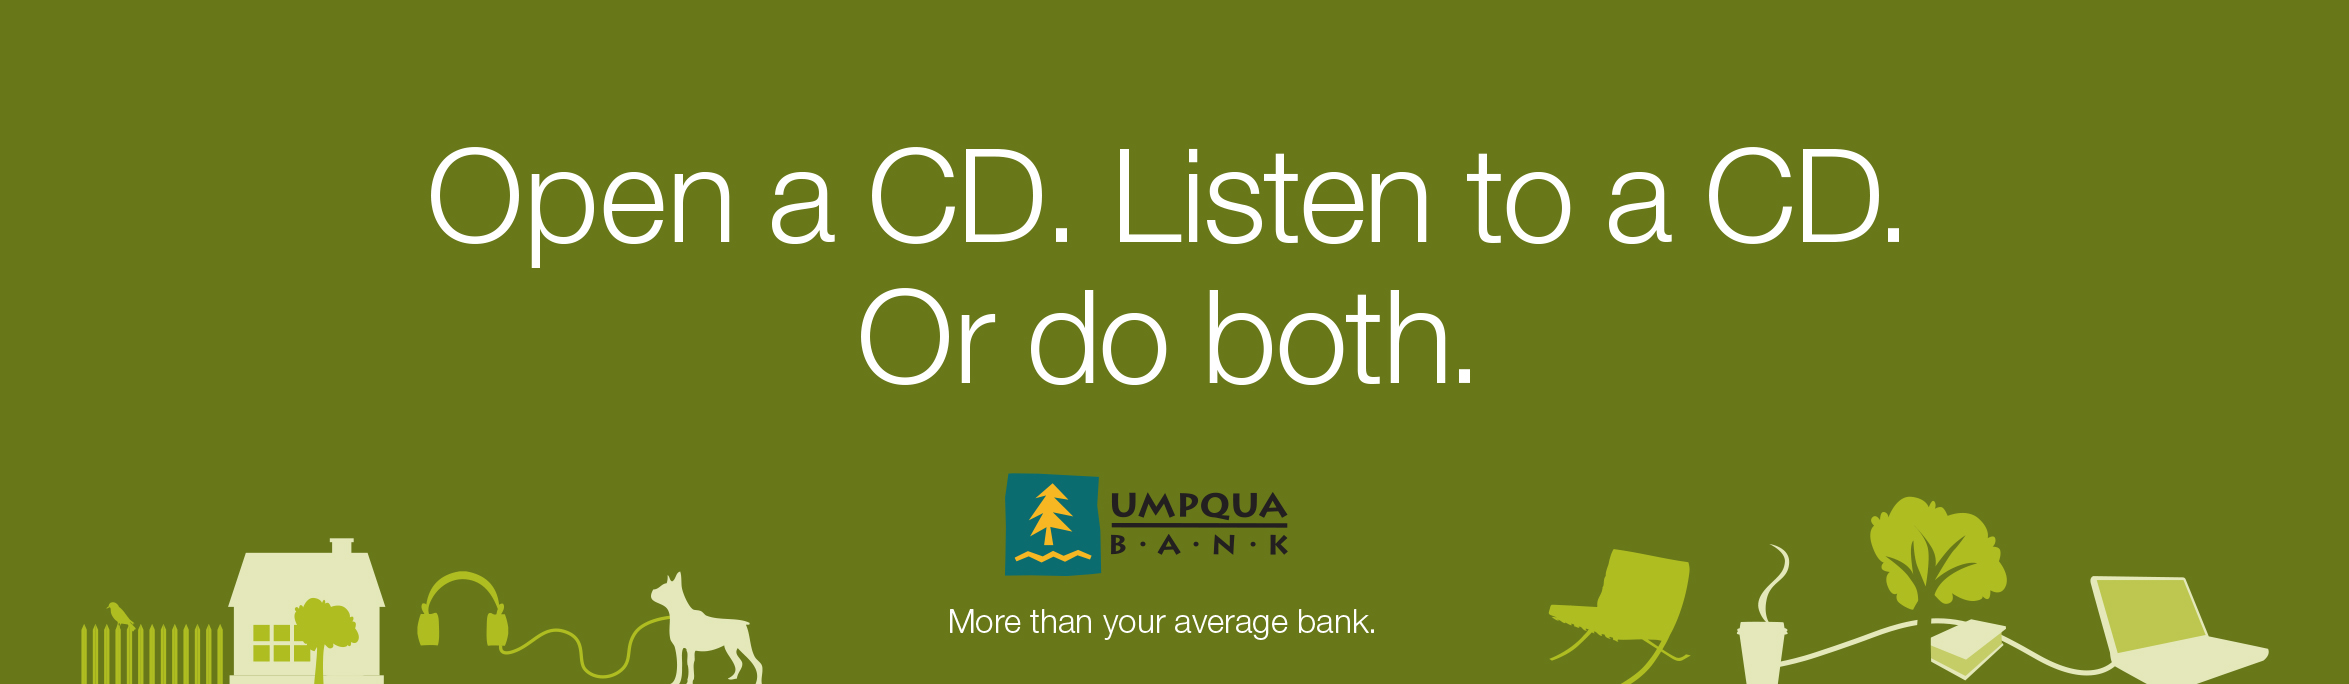 Umpqua_OOH_Listen.jpg